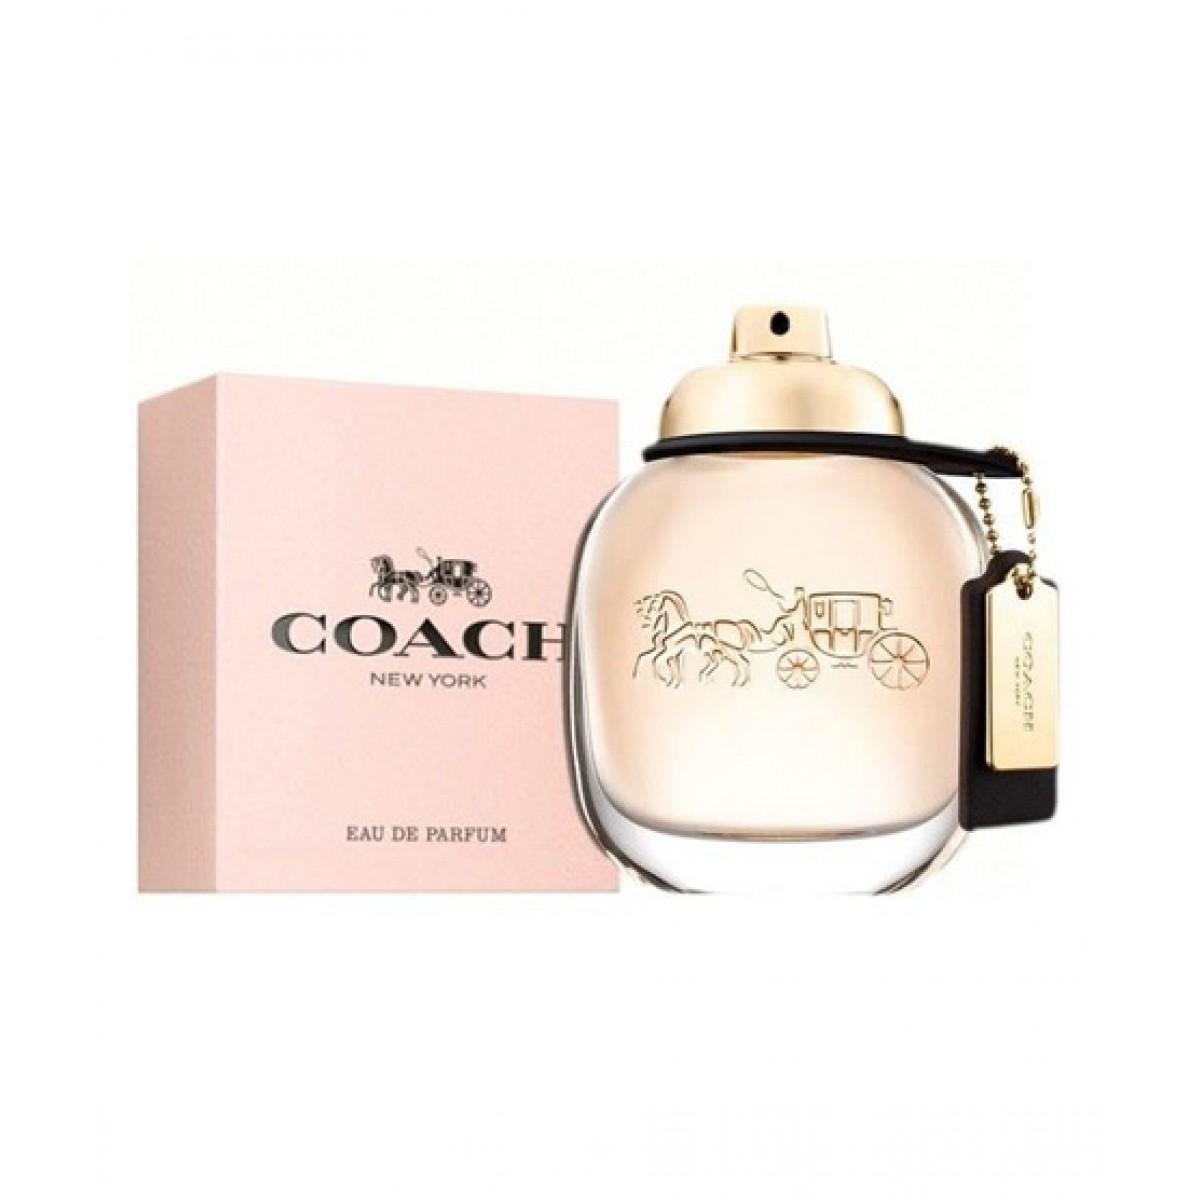 0c96eb2f30ff Coach EDP Perfume For Women Price in Pakistan | Buy Coach Perfume For Women  30ML | iShopping.pk